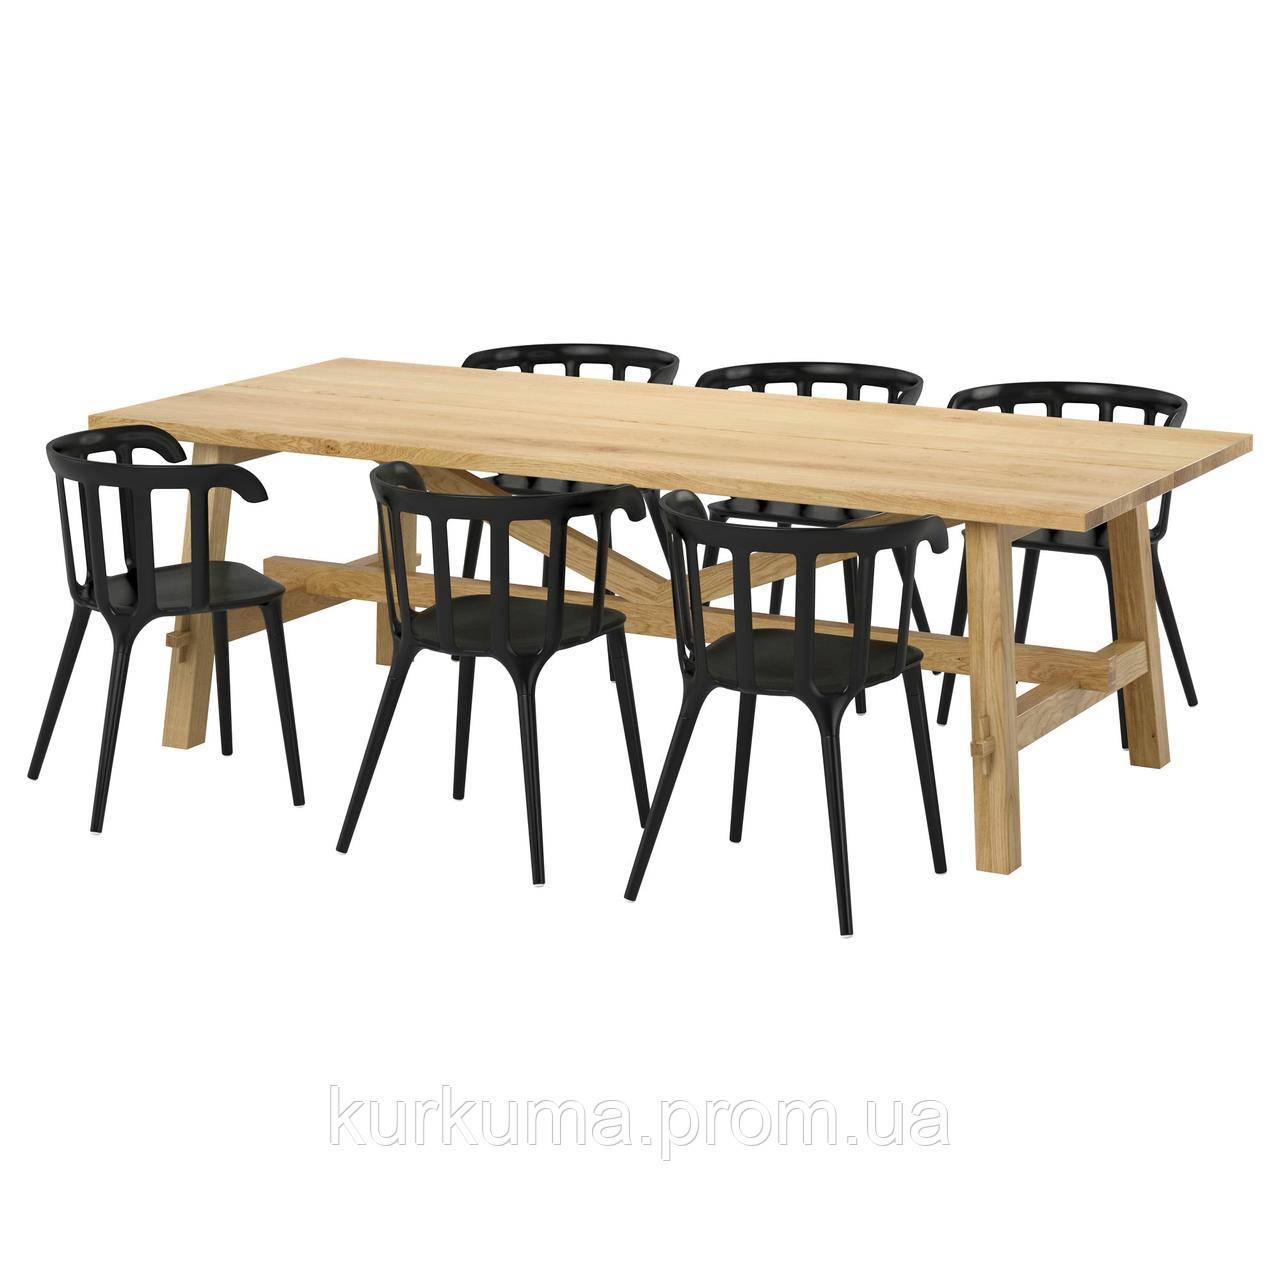 IKEA MOCKELBY/IKEAPS2012 Стол и 6 стульев, дуб, черный  (991.317.90)